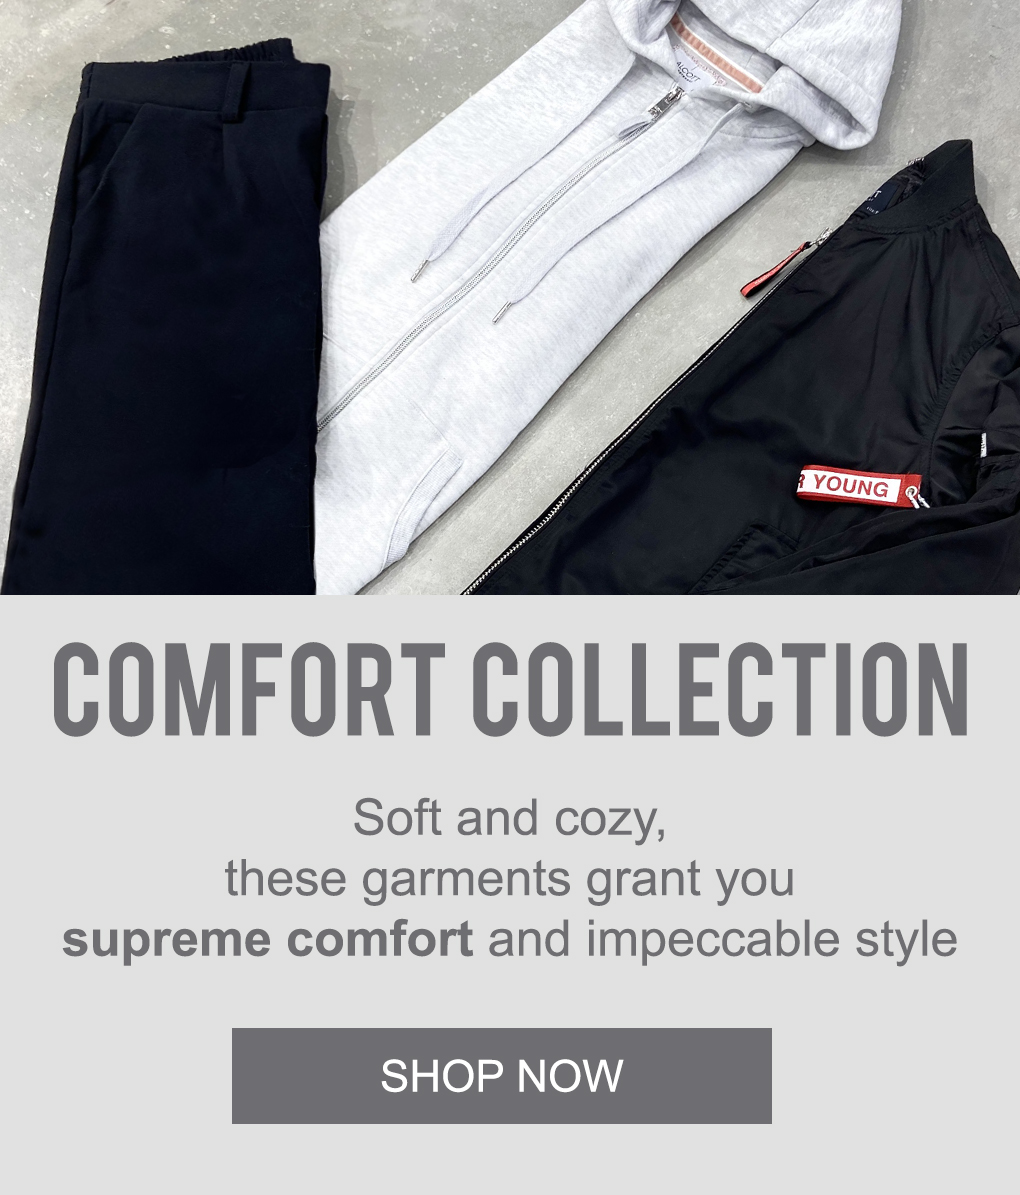 women-clothing-comfort